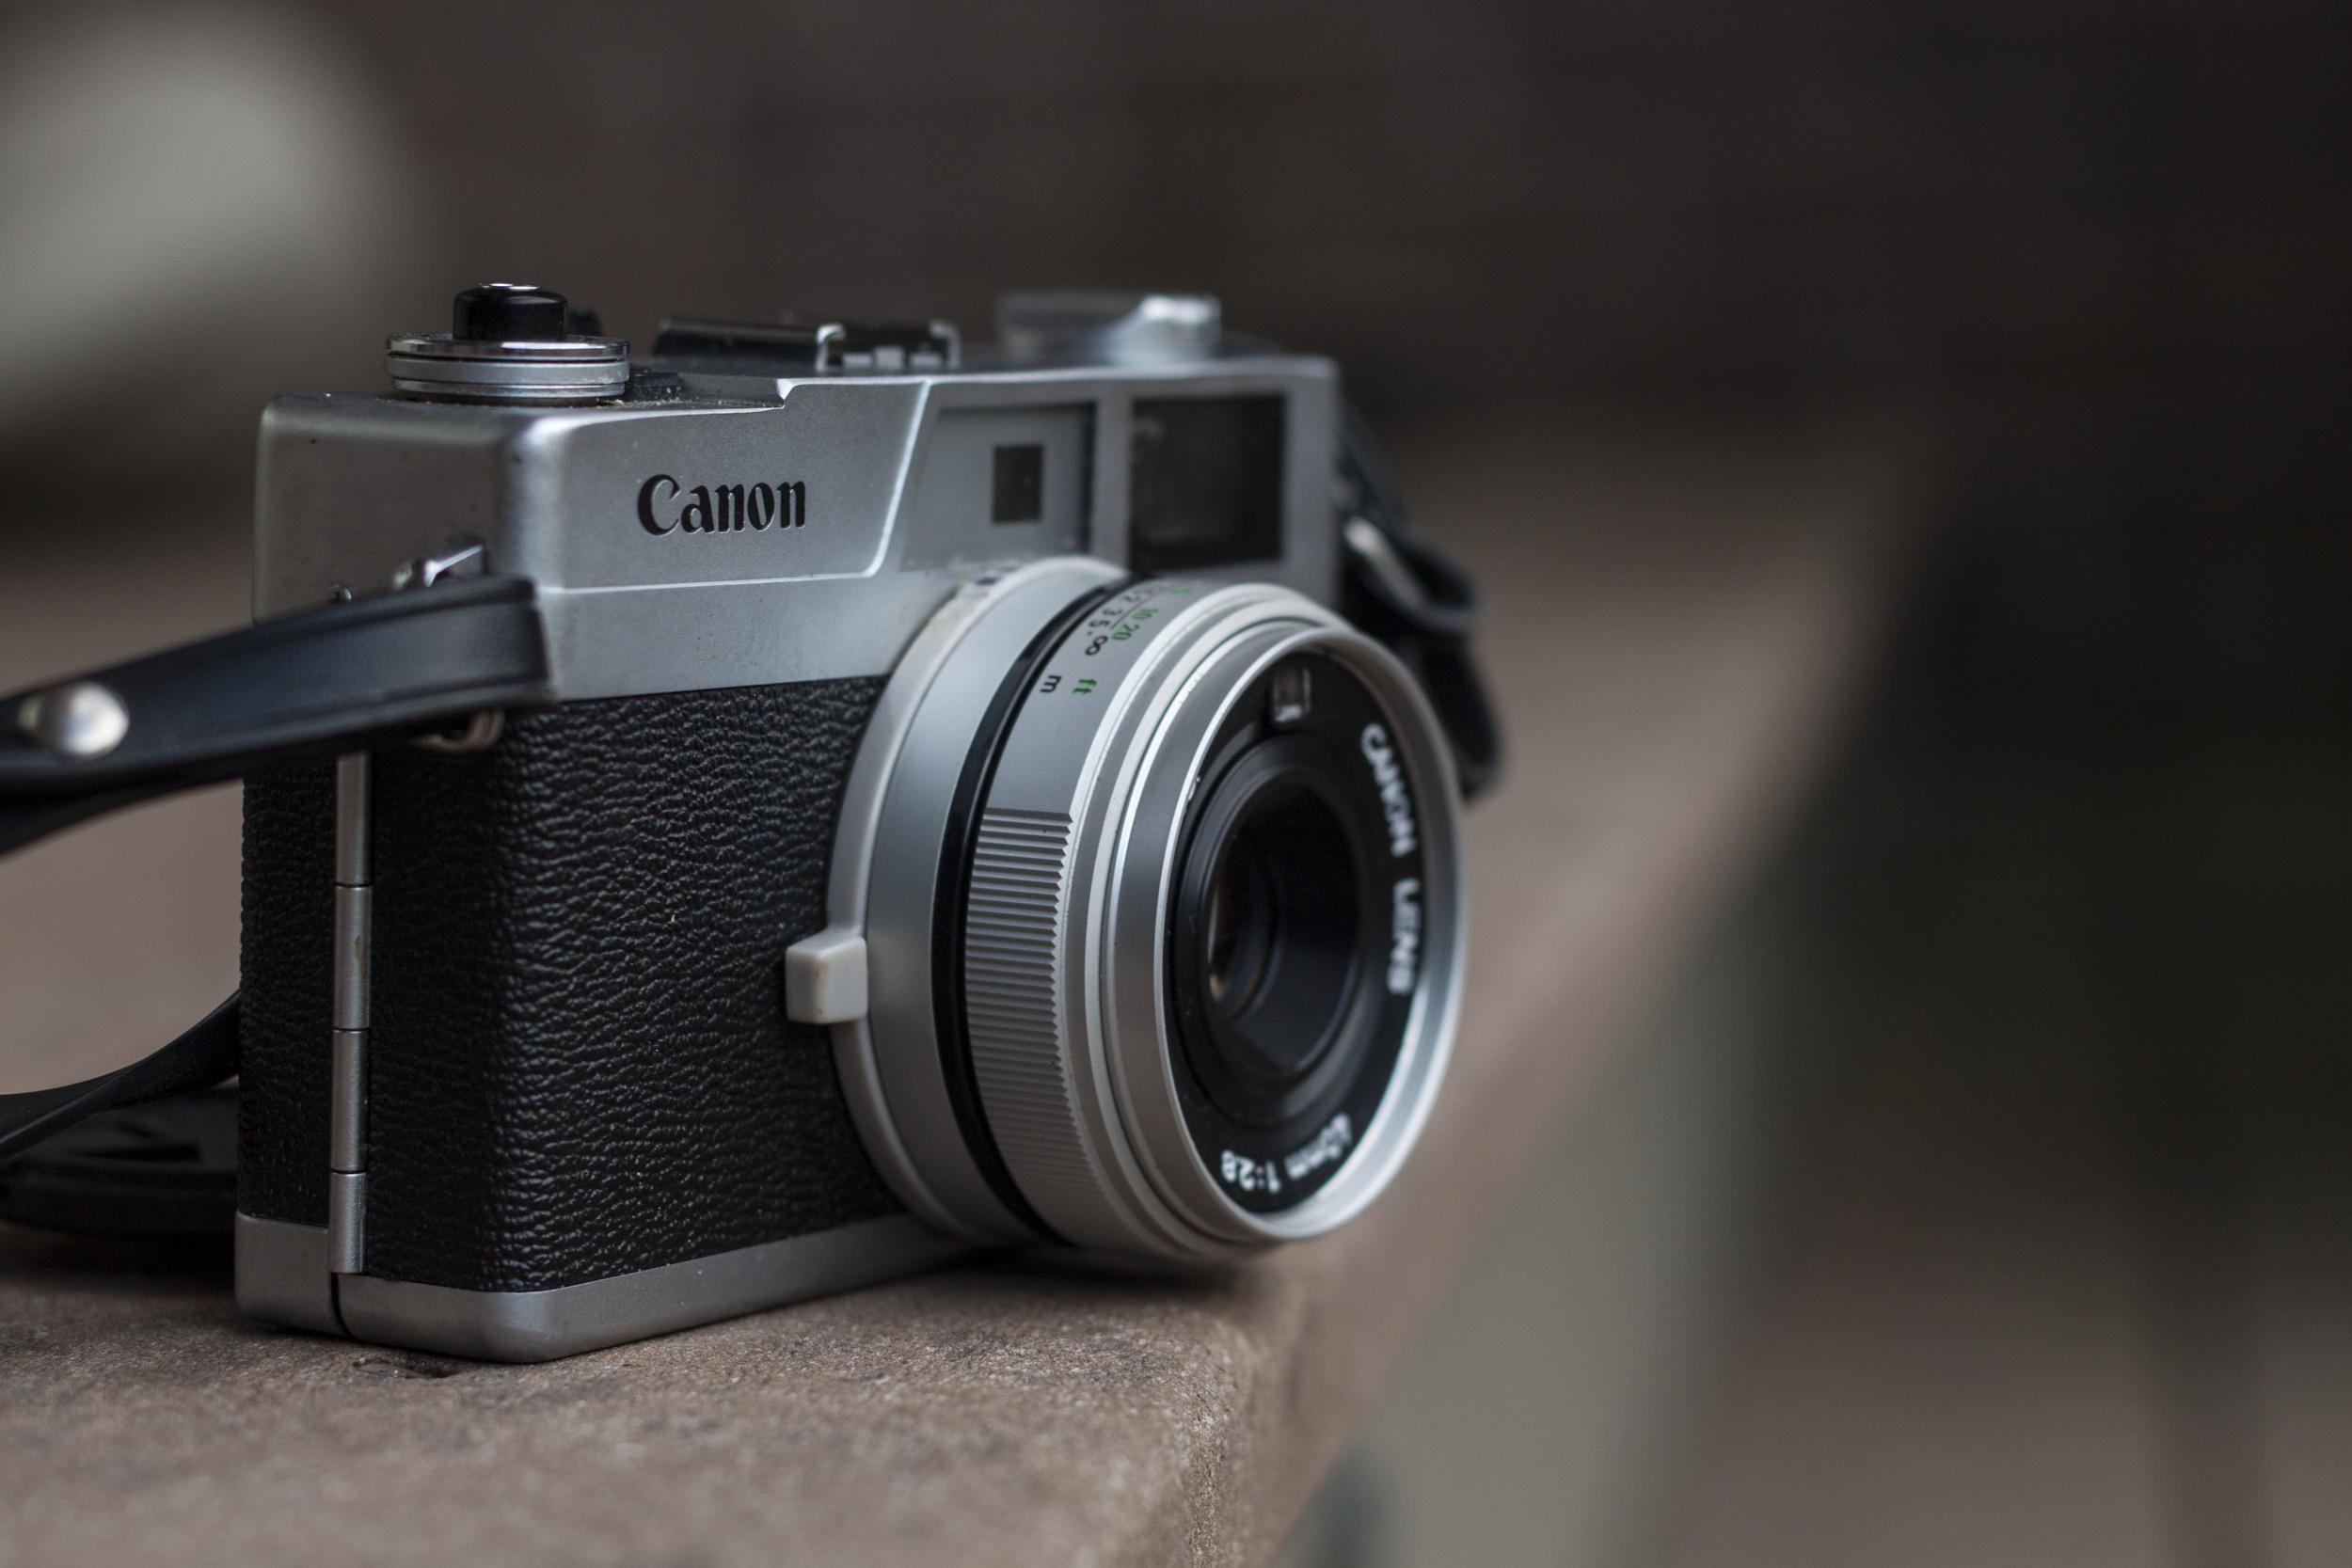 canonet-28-40mm-f28_14192964496_o.jpg